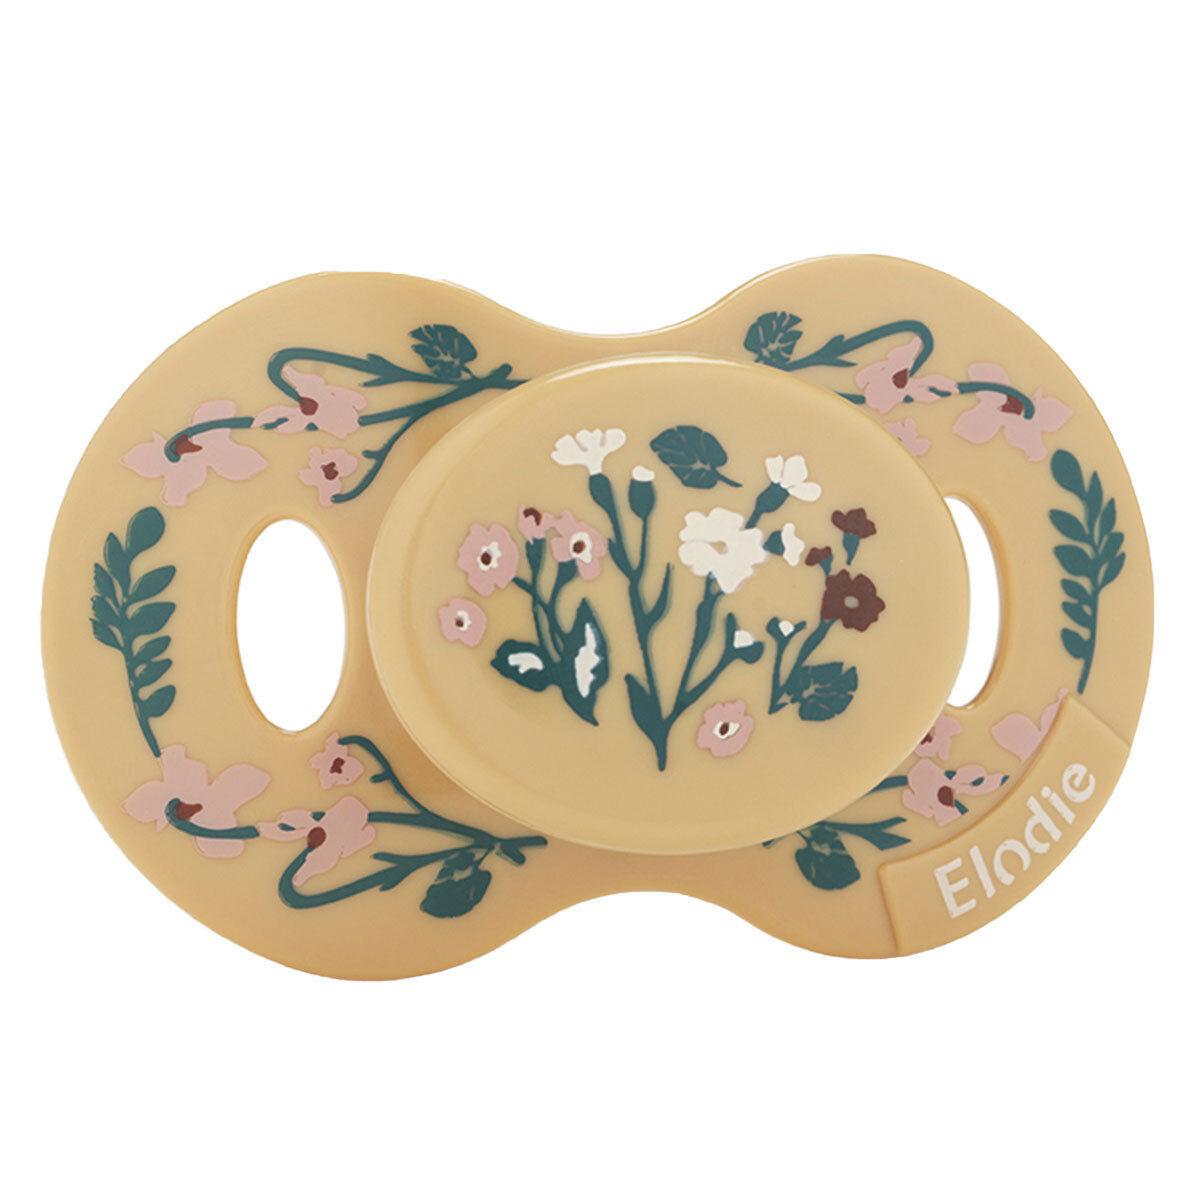 Elodie Details Sucette - Vintage Flower